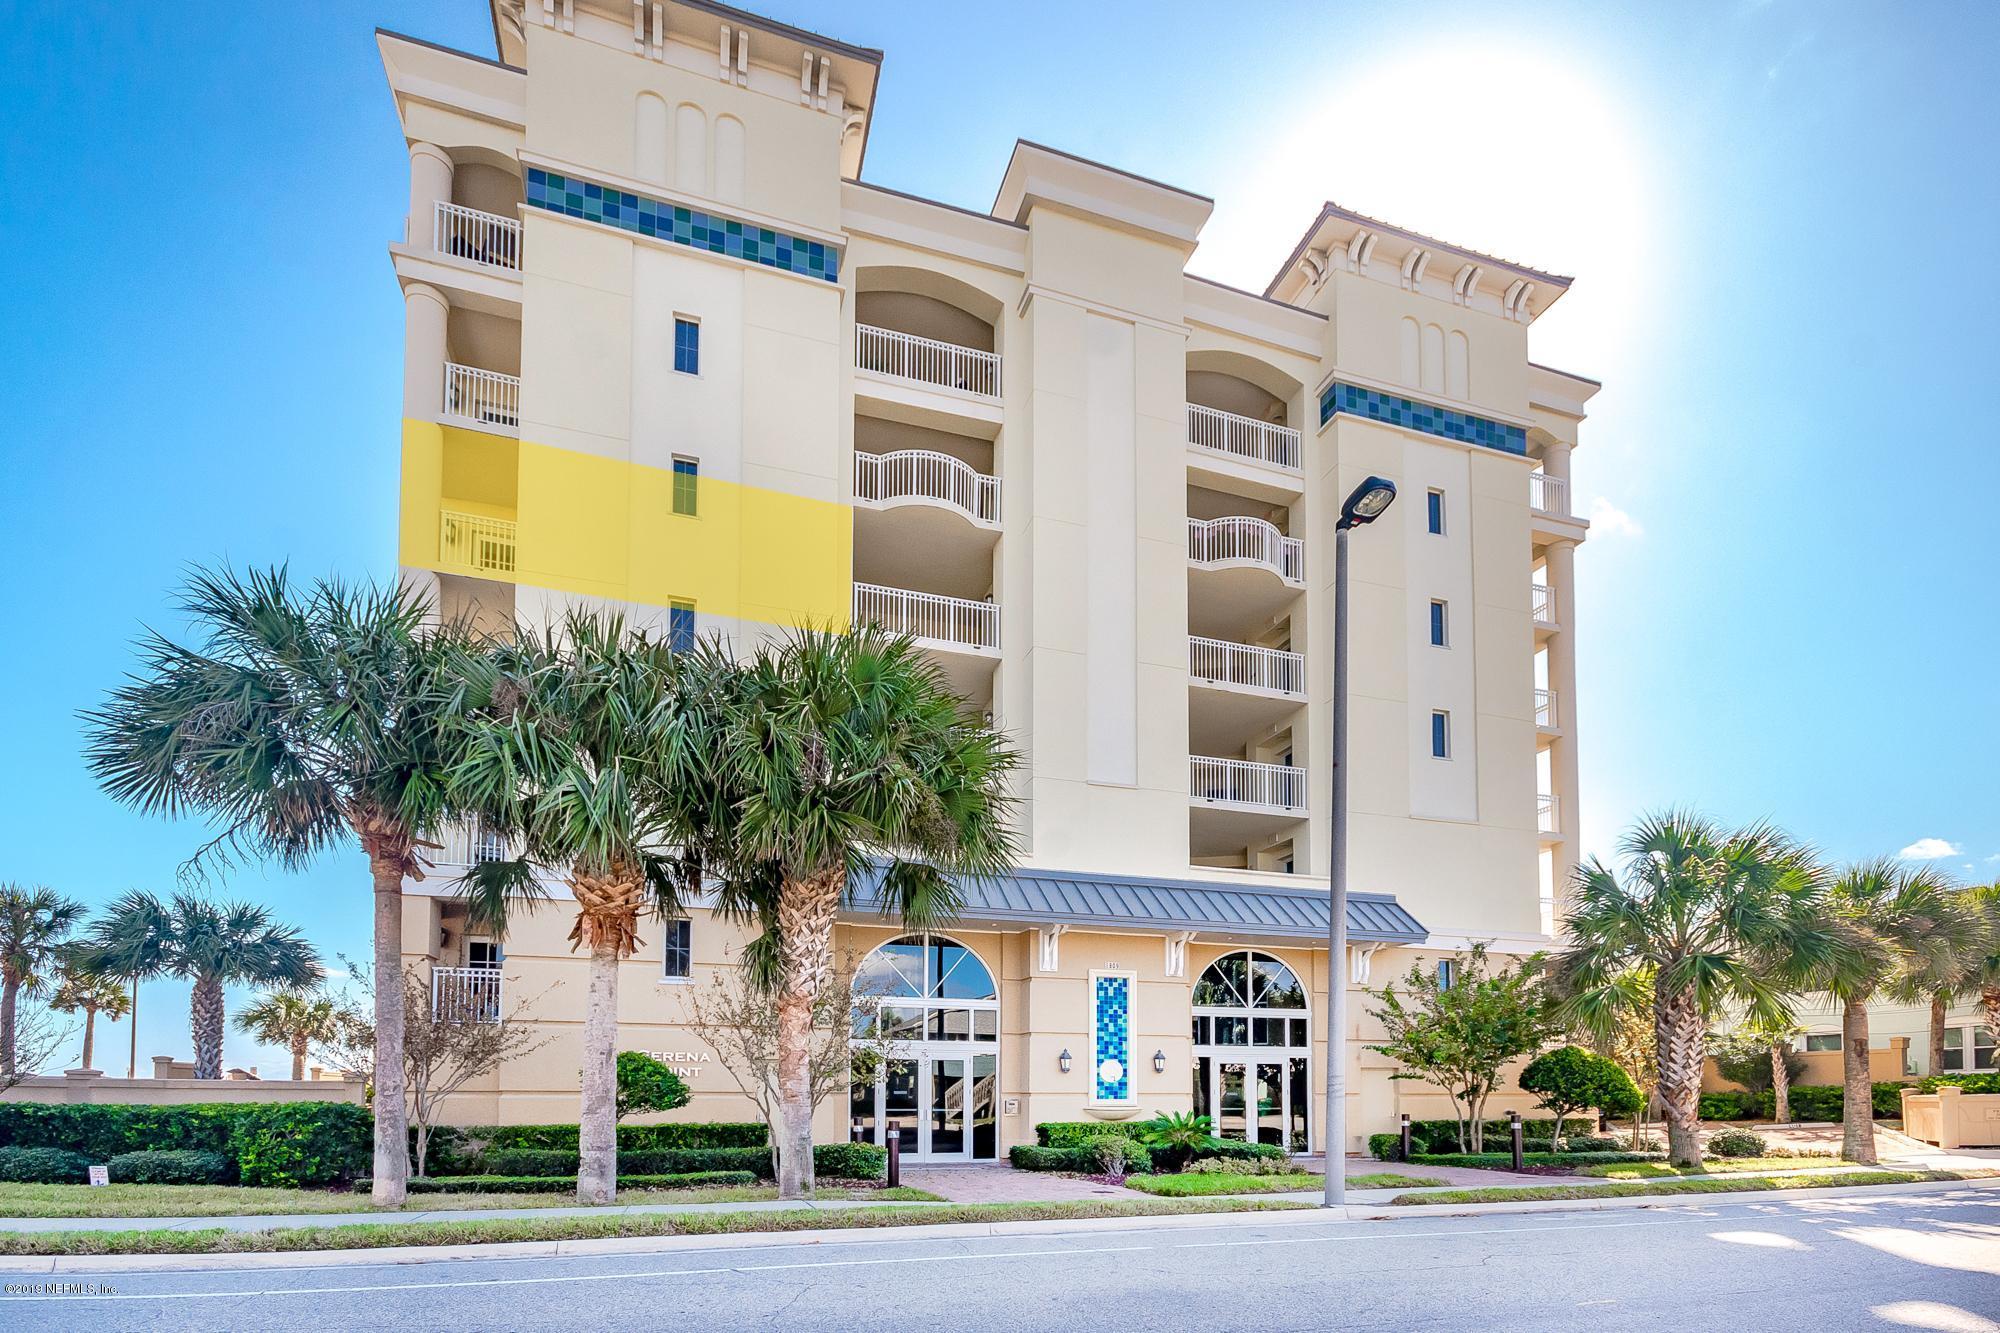 1809 1ST- JACKSONVILLE BEACH- FLORIDA 32250, 3 Bedrooms Bedrooms, ,3 BathroomsBathrooms,Condo,For sale,1ST,1017563